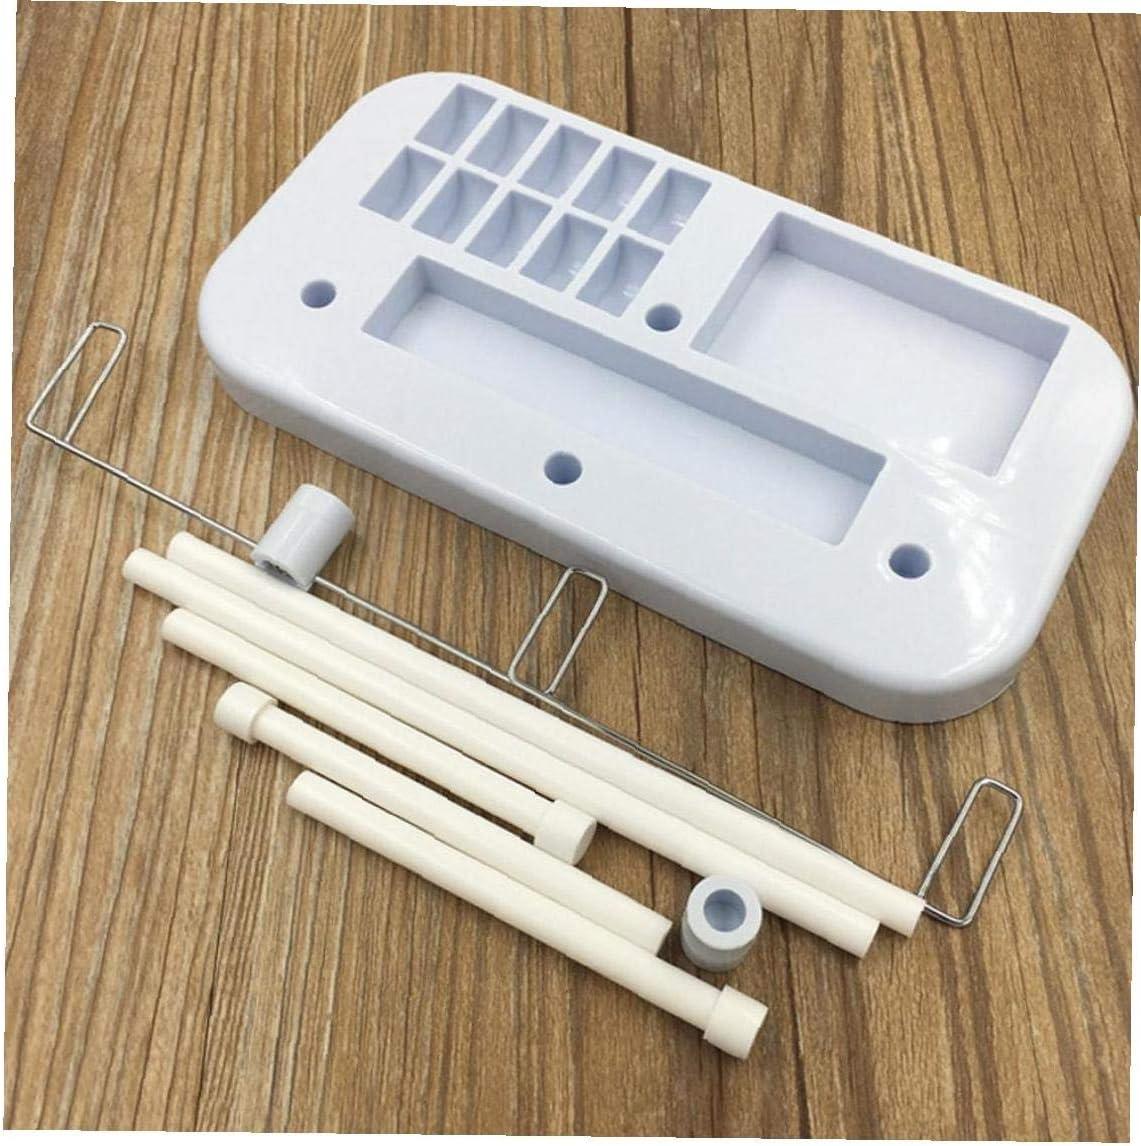 Hilo de coser m/áquina de coser m/áquina de soporte de herramientas Ajustable de 3 bobinas de hilo de rosca de pl/ástico titular de costura soporte 1PC azul claro